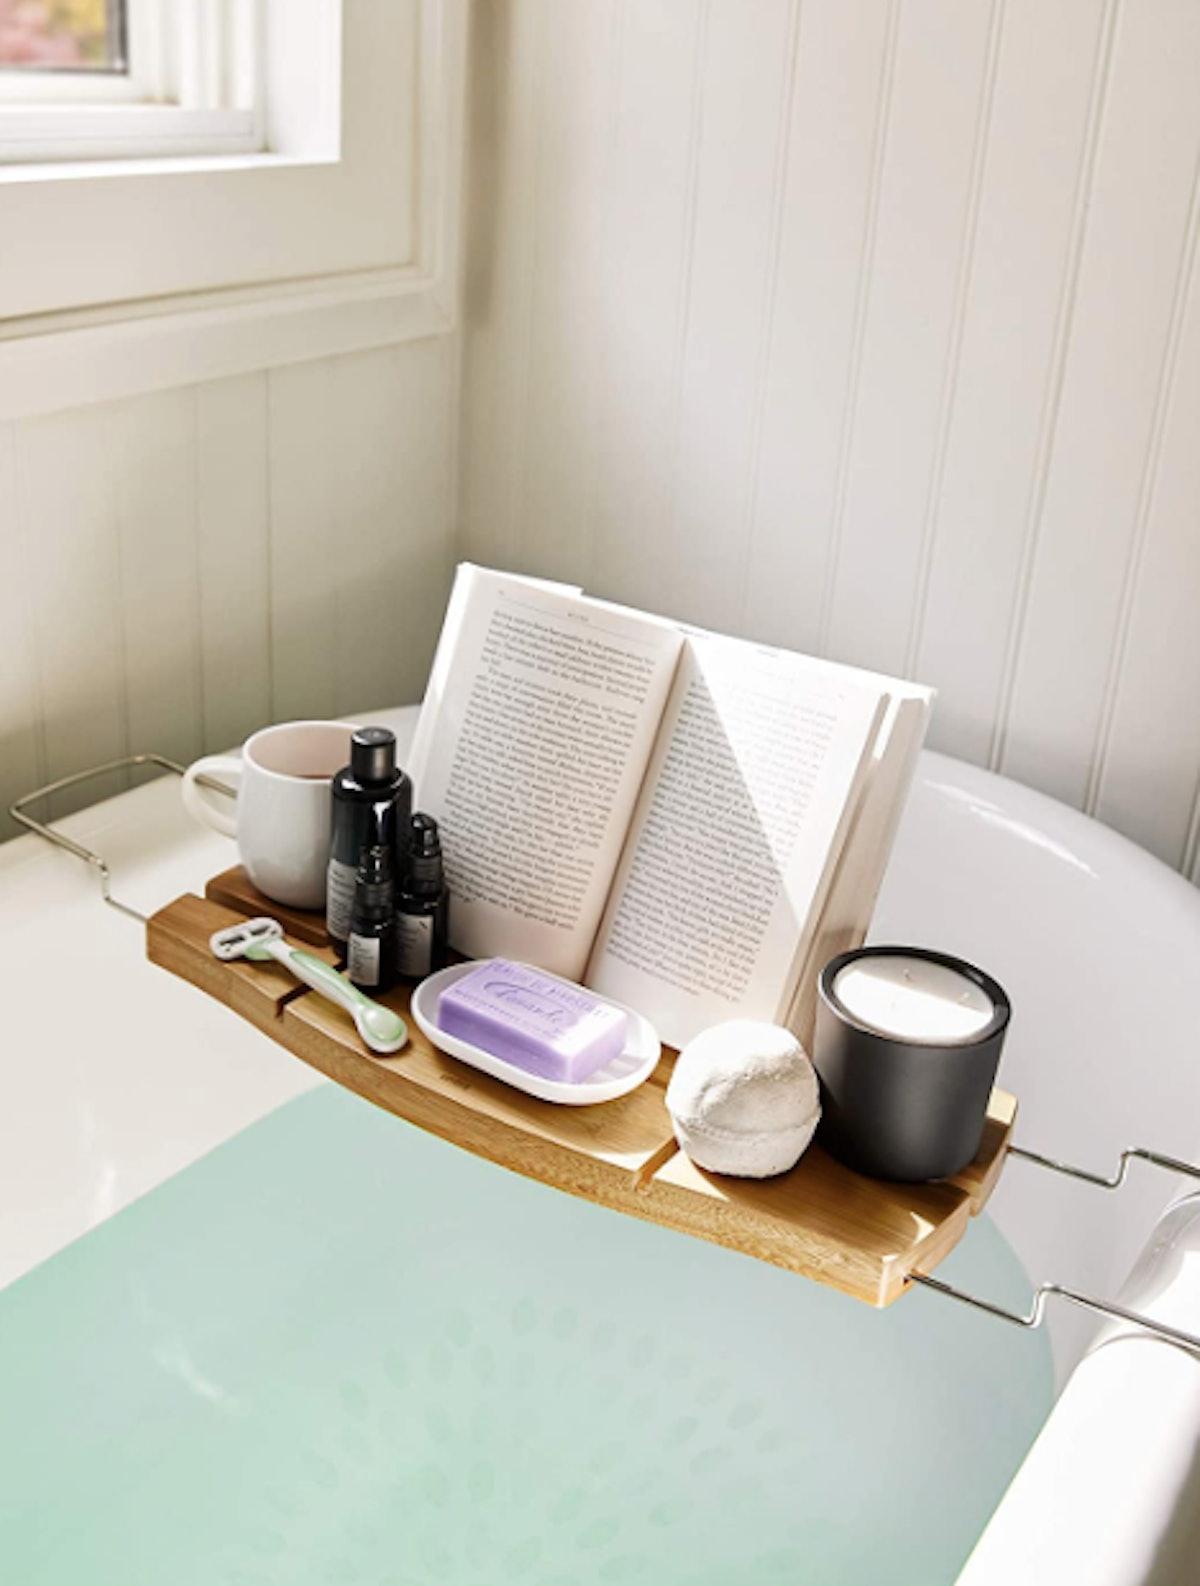 Umbra Aquala Bamboo Luxury Bath Caddy